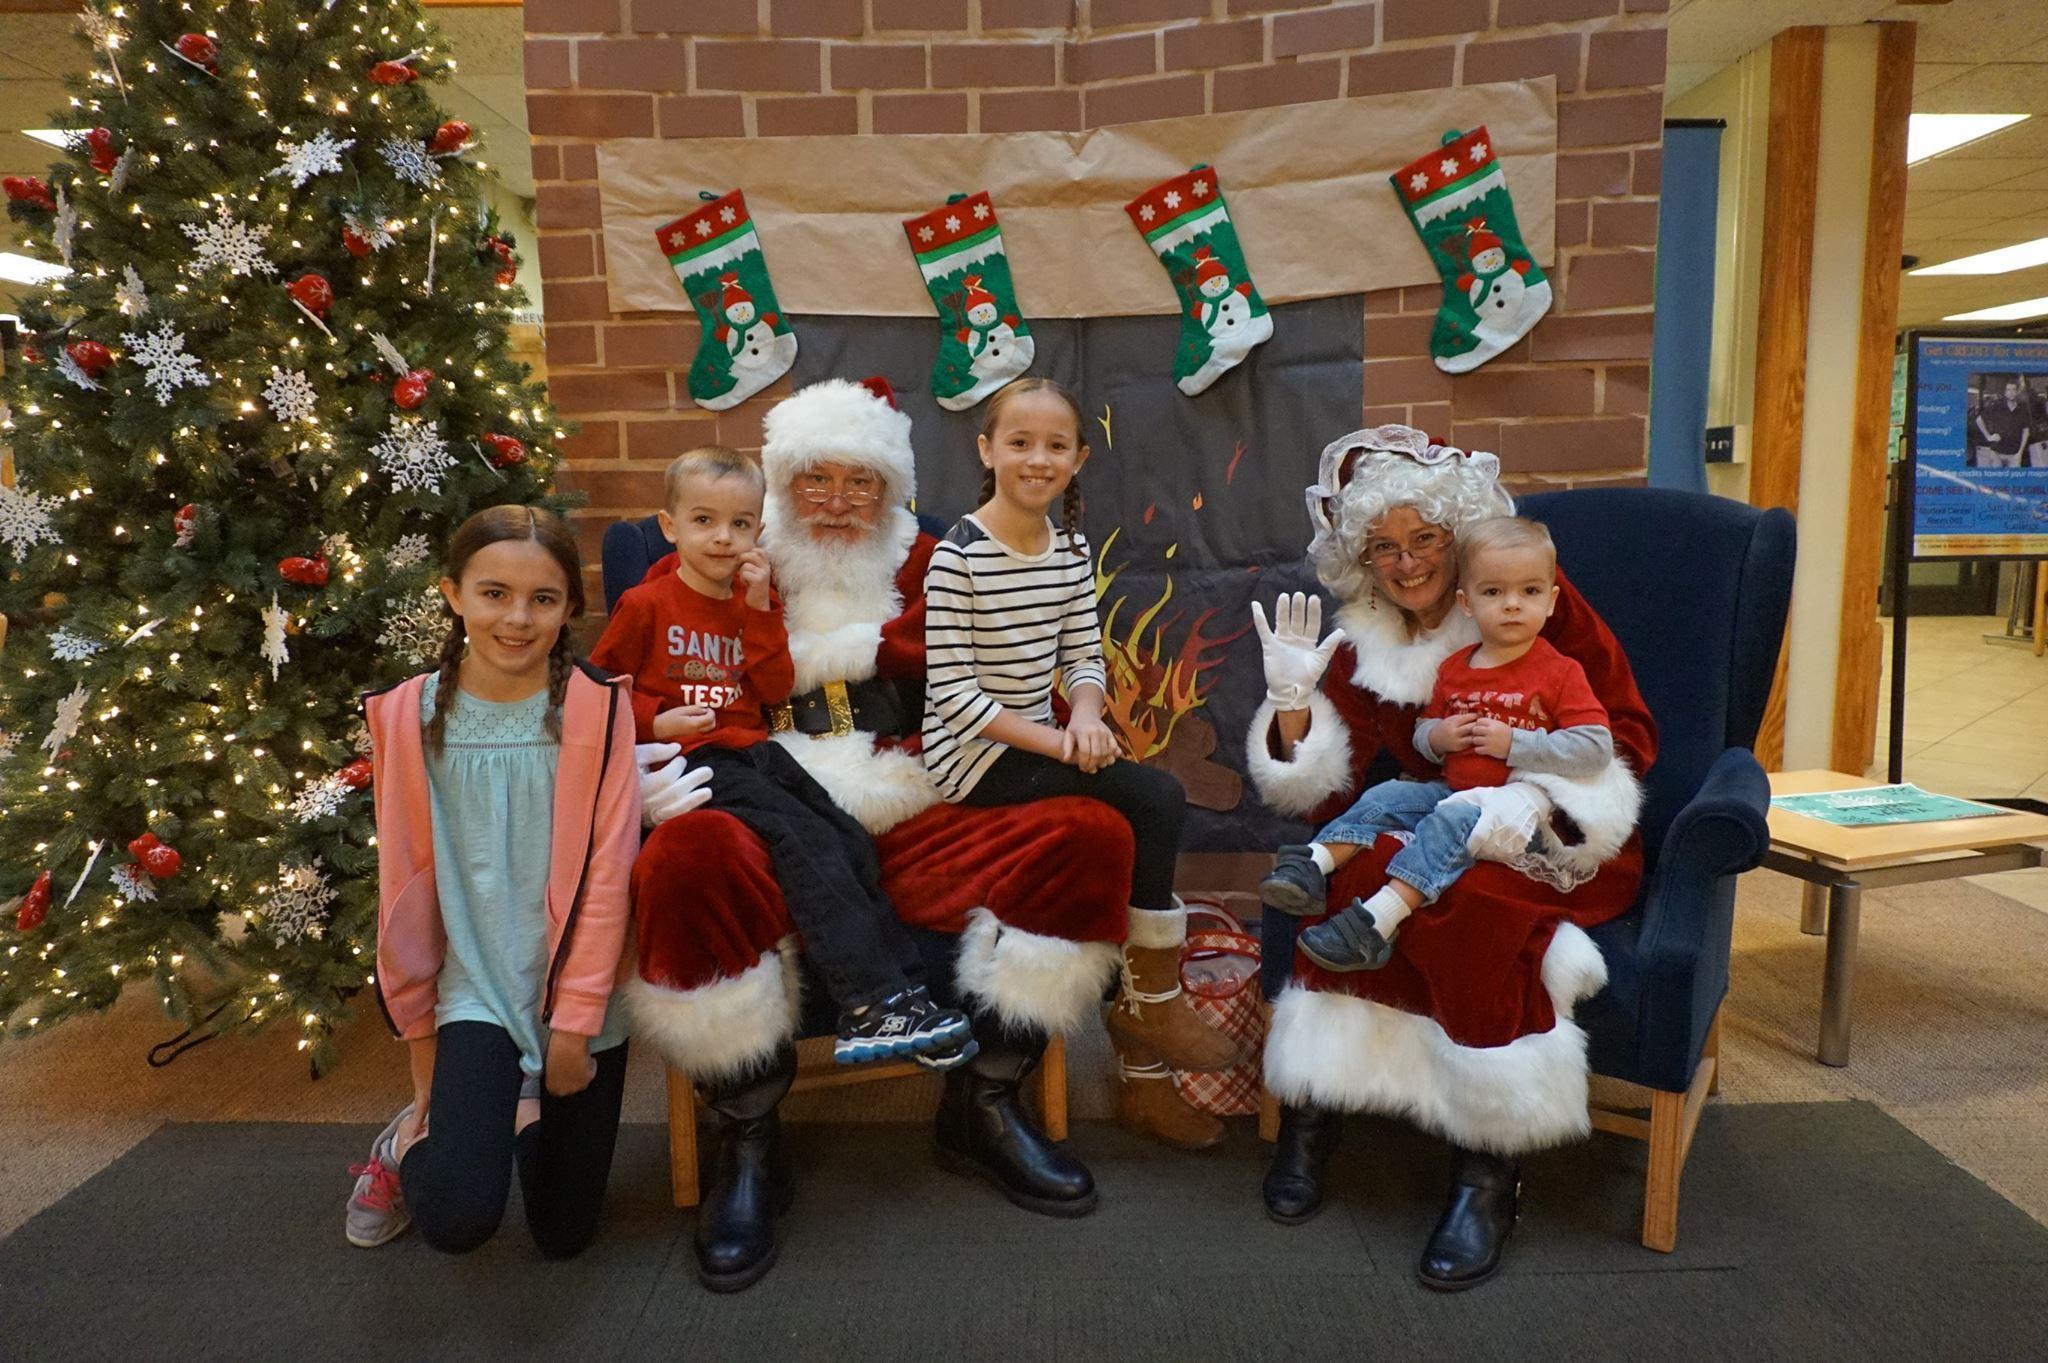 Utah Families Follow Santa\'s Trek With Help From NORAD | KUER 90.1